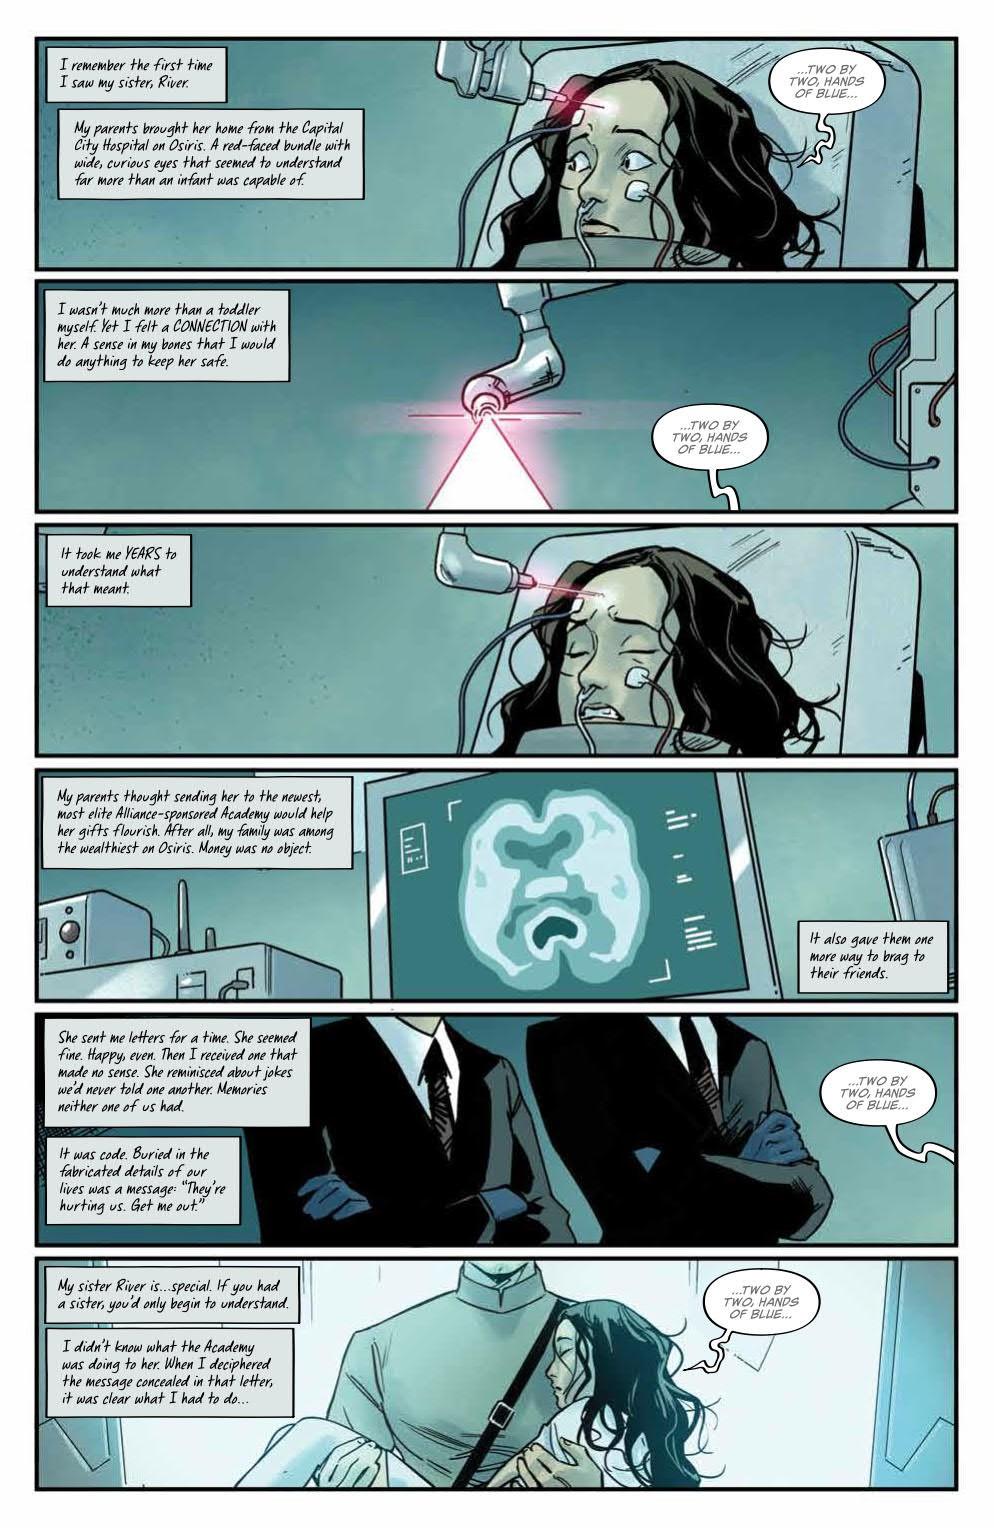 Firefly_RiverRun_001_PRESS_2 ComicList Previews: FIREFLY RIVER RUN #1